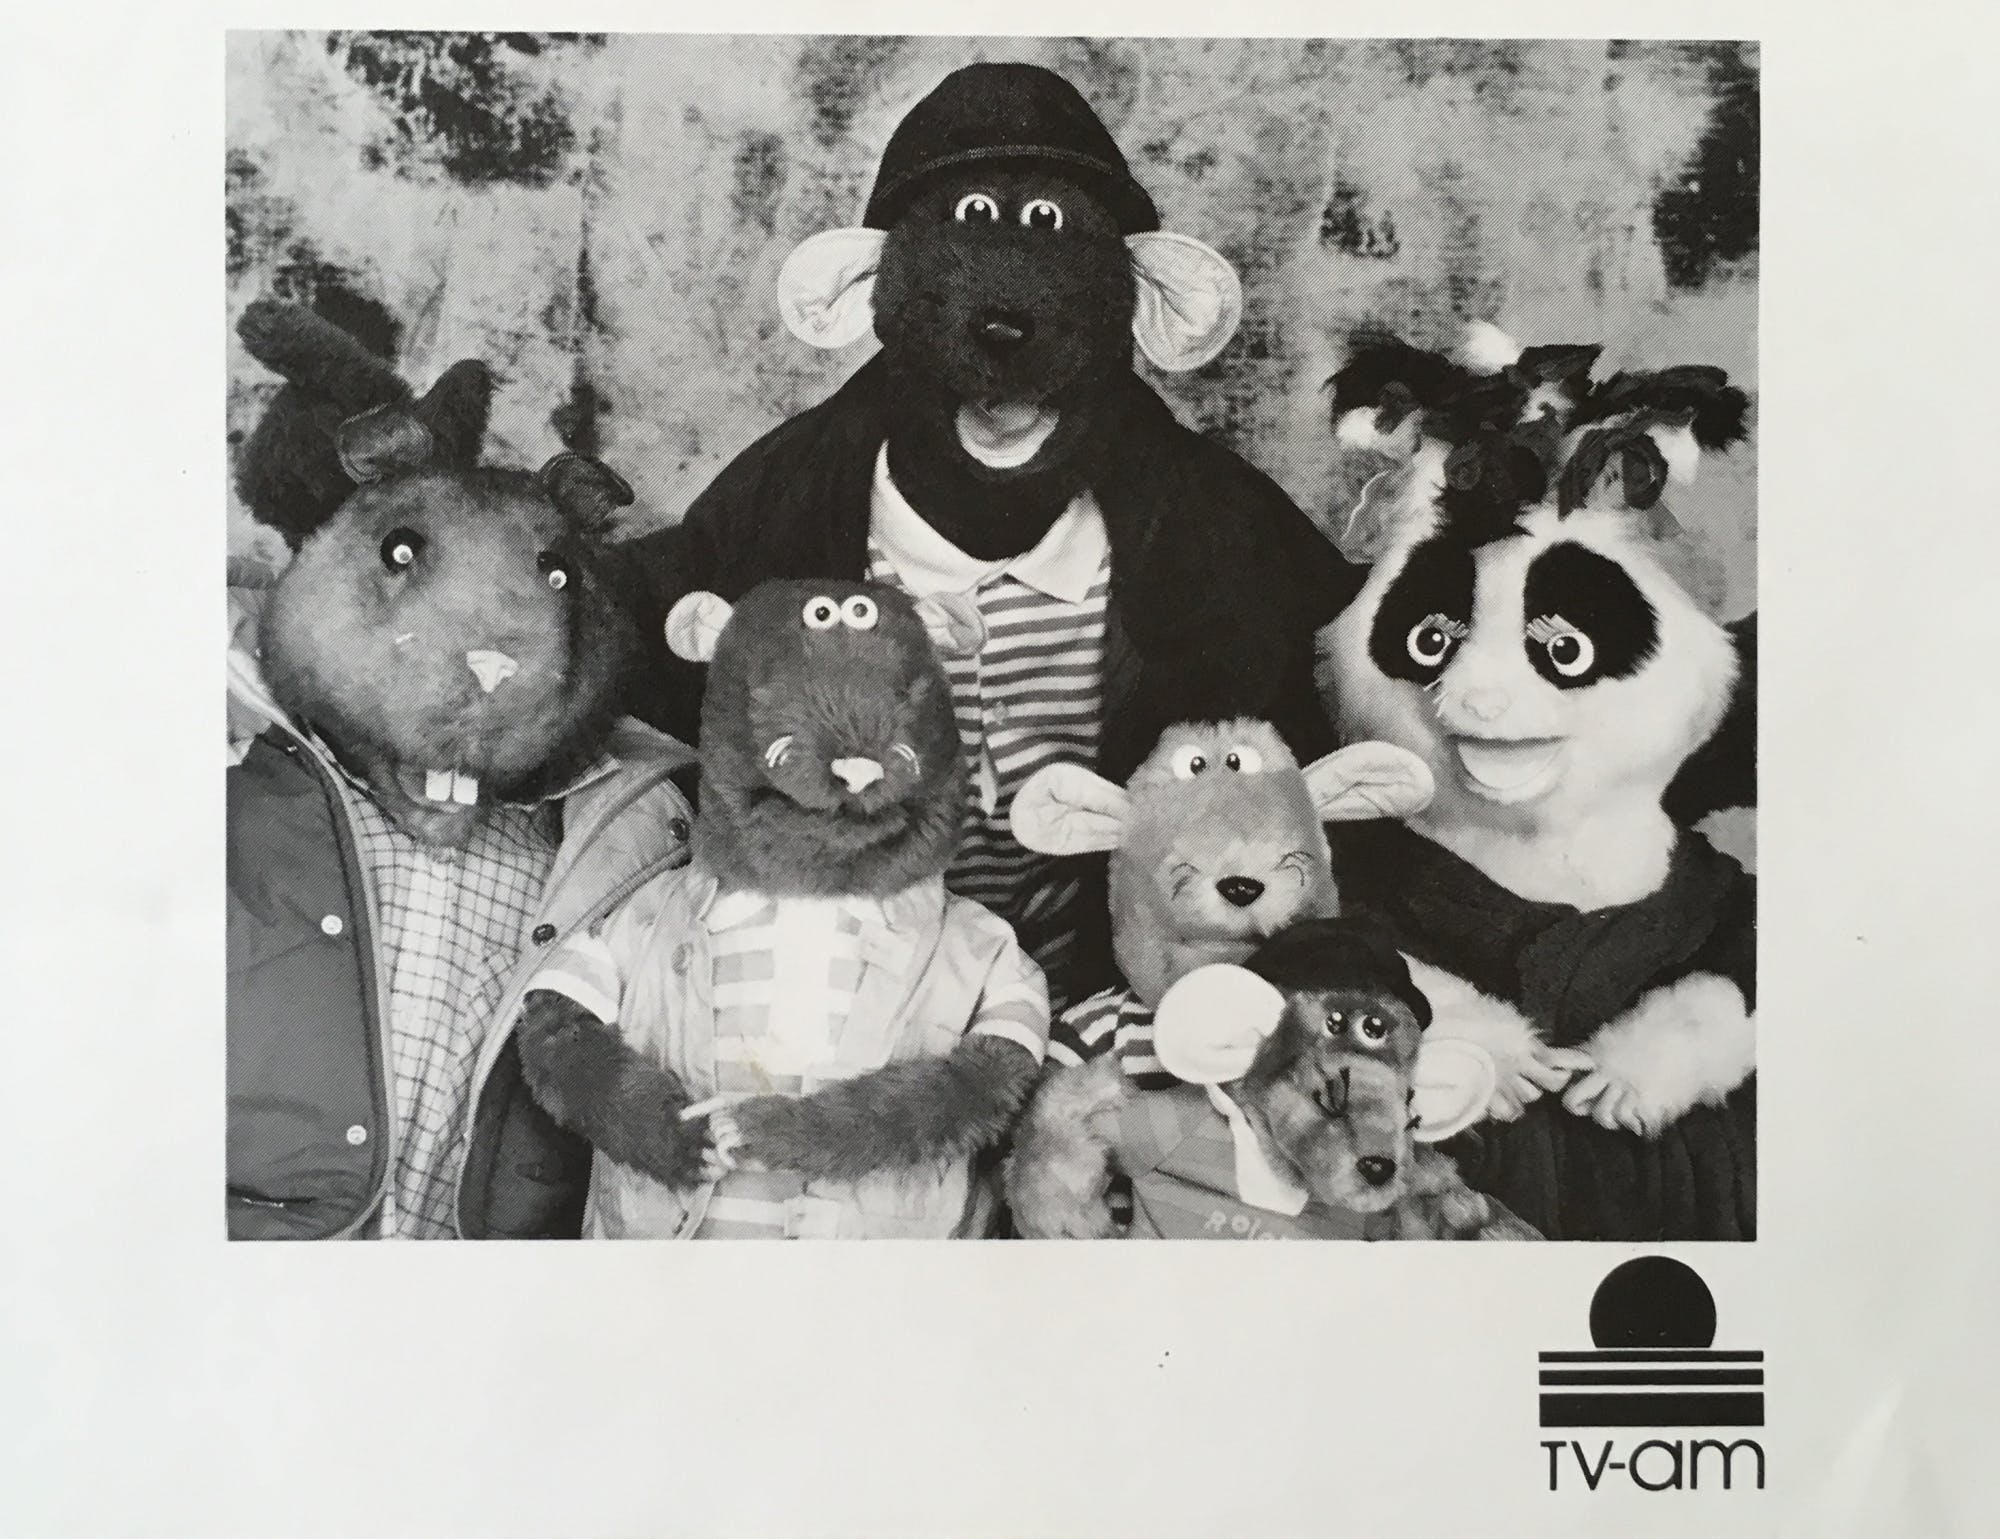 Operation FOGI, Roland Rat TV-am